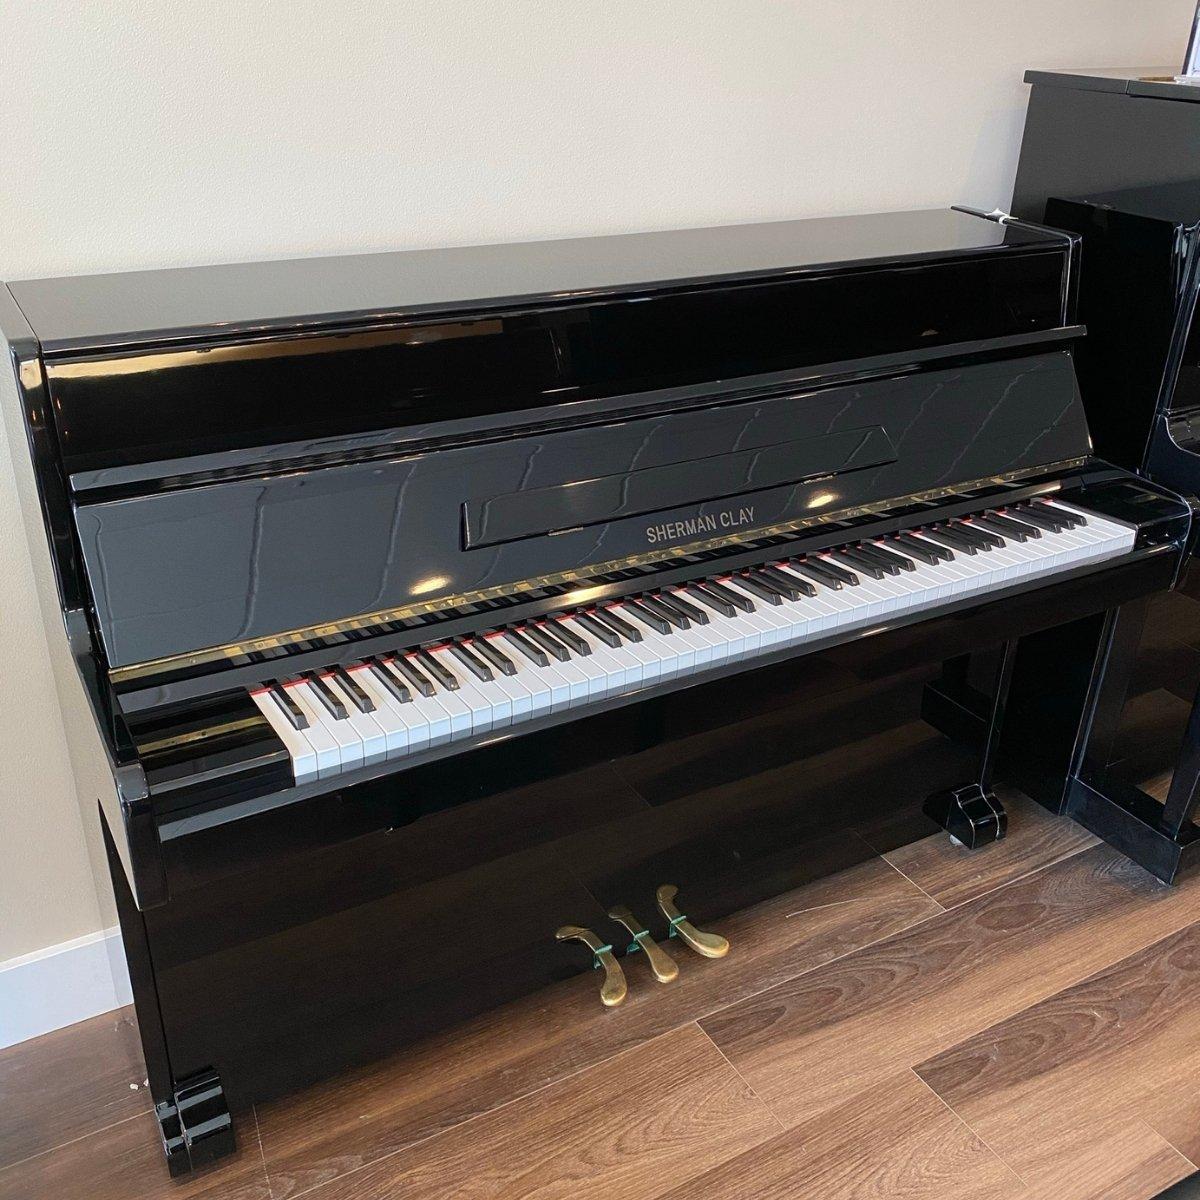 Sherman Clay 43 Model SRS-11 Upright Piano